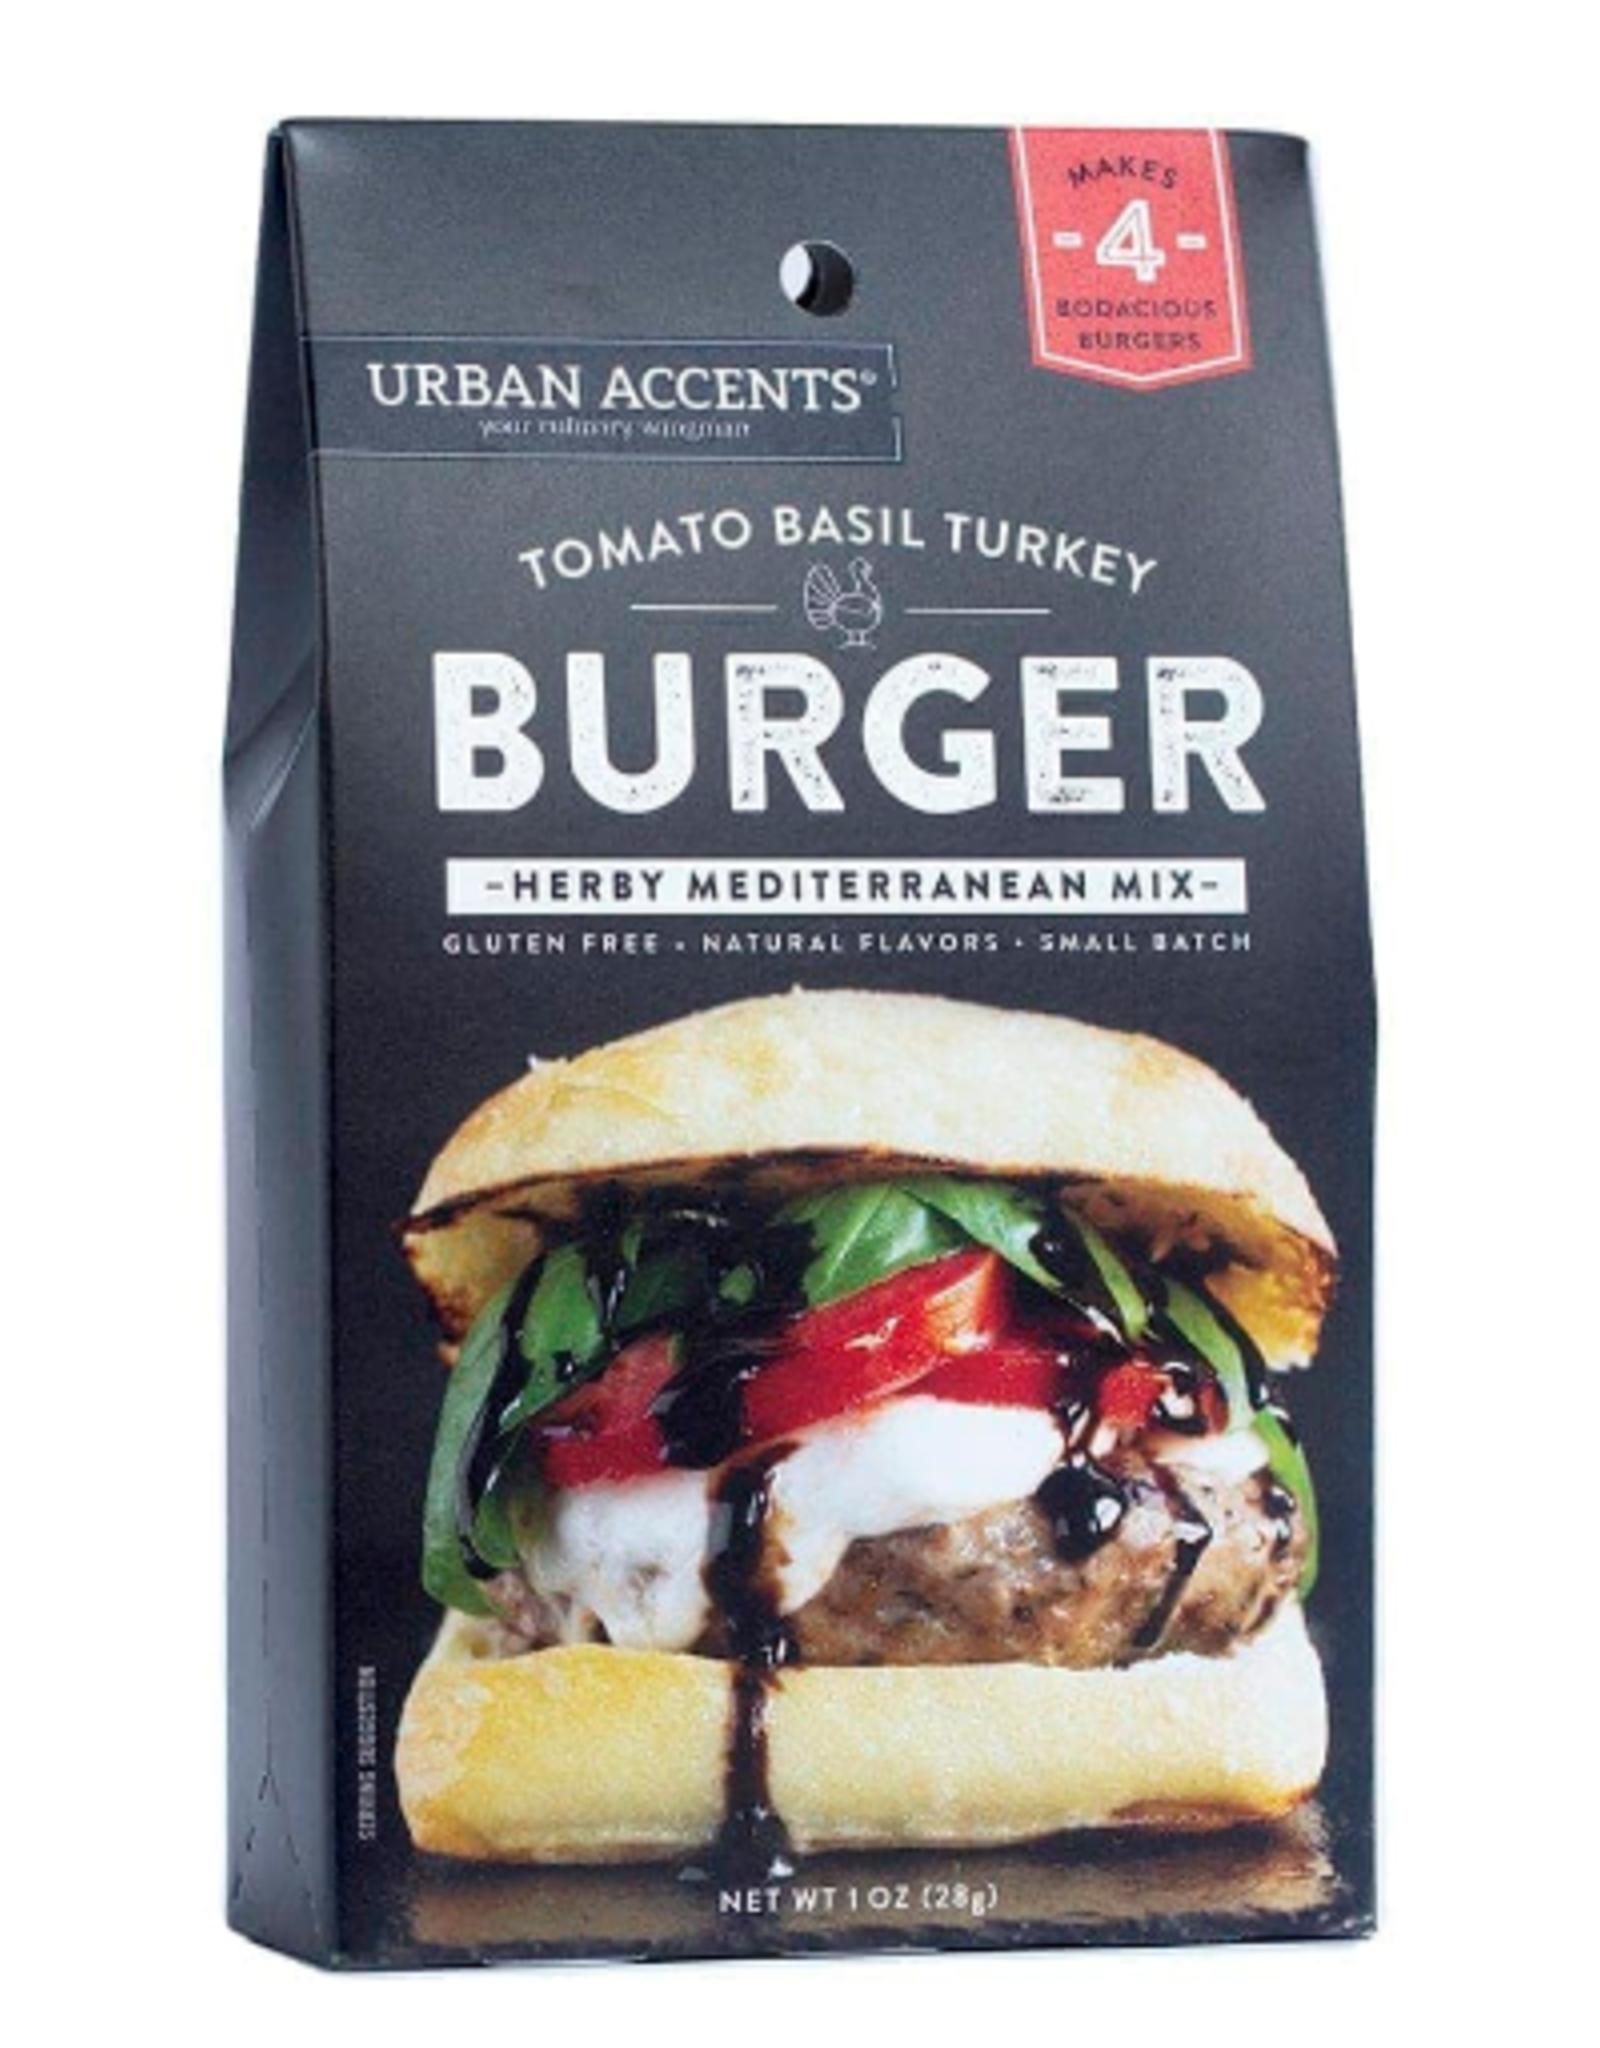 Urban Accents Burger Seasoning, Tomato Basil Turkey